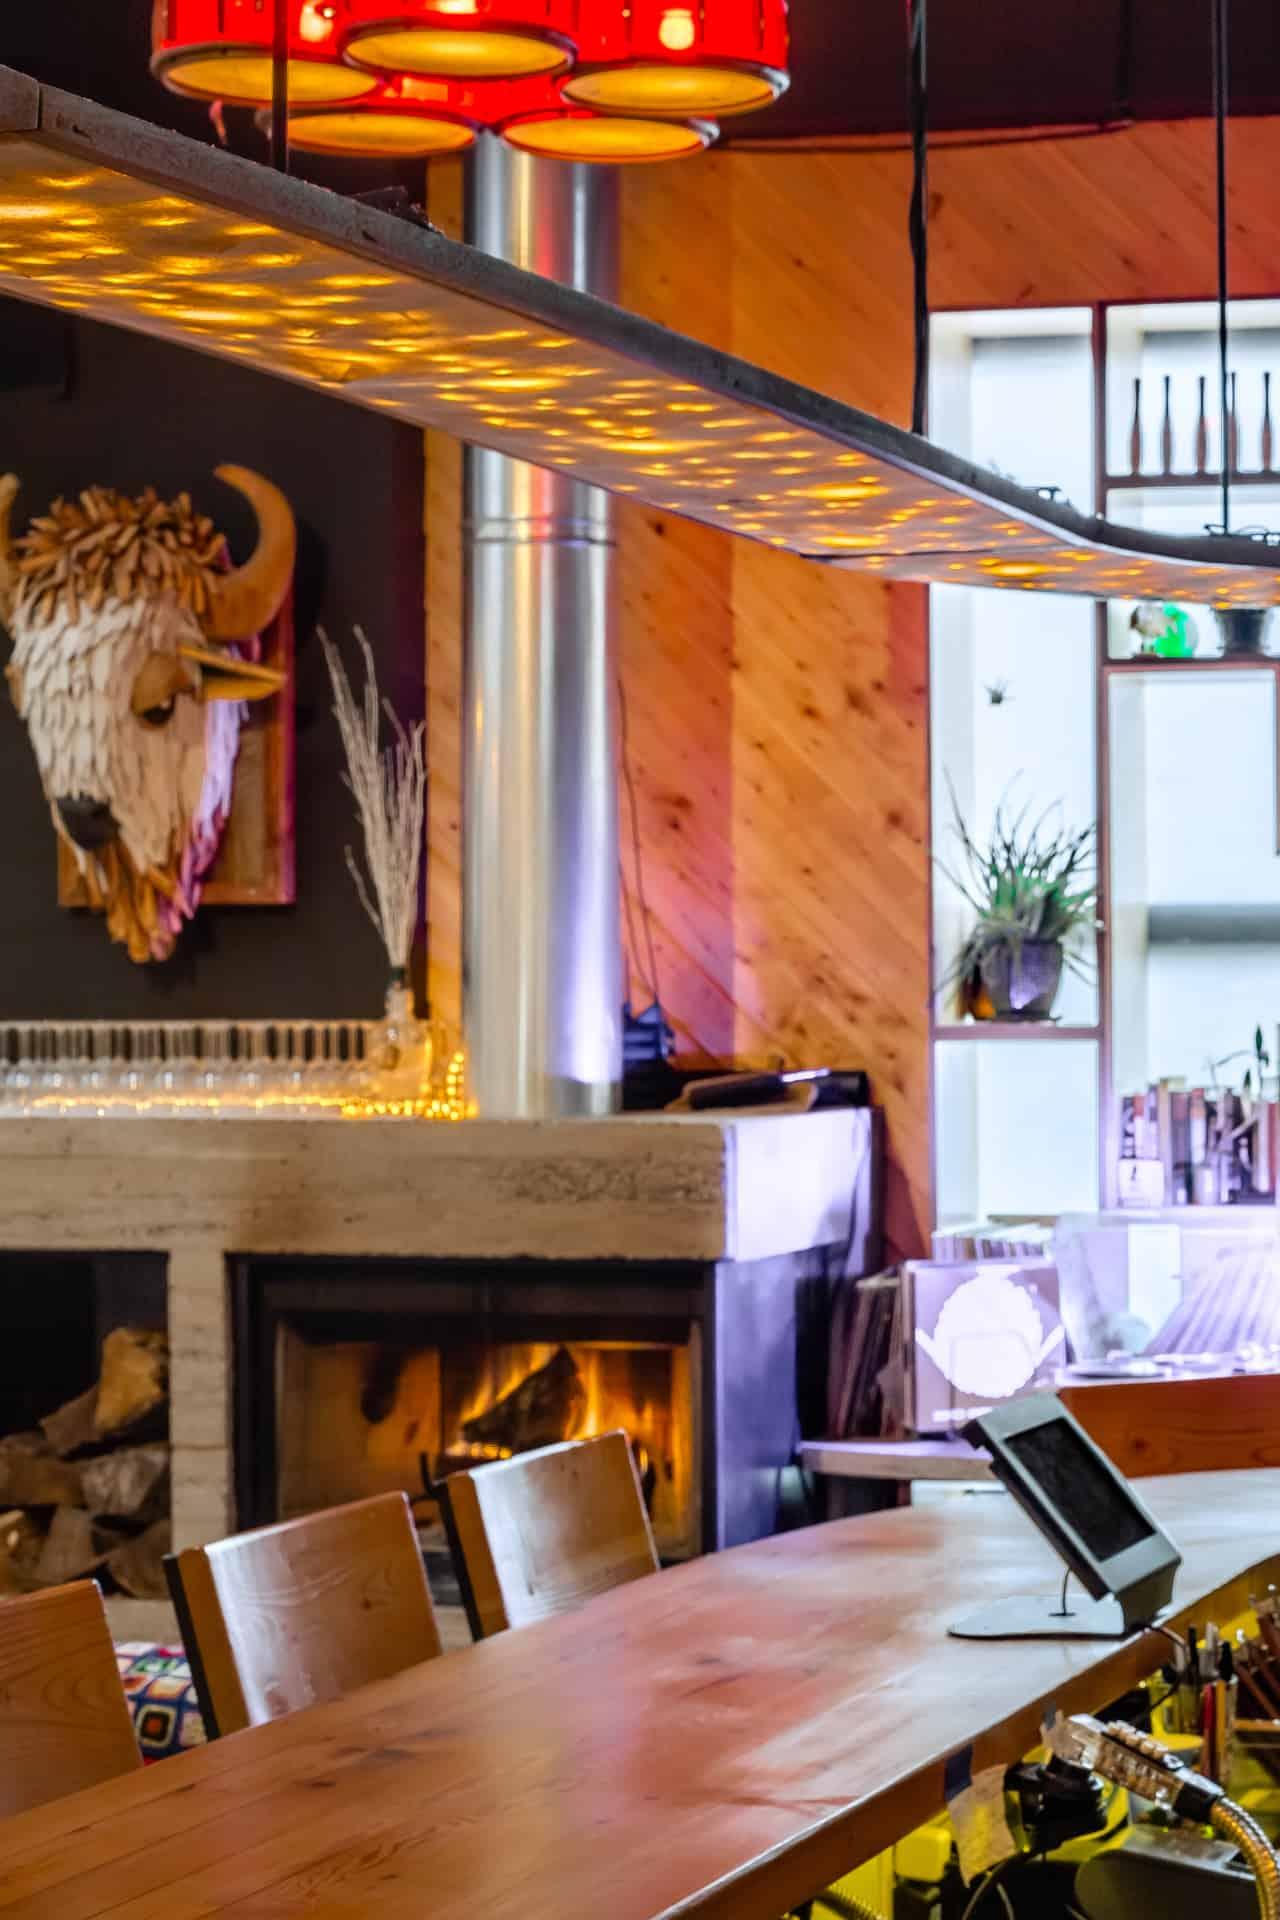 Restaurant Photograph of Martha in Philadelphia